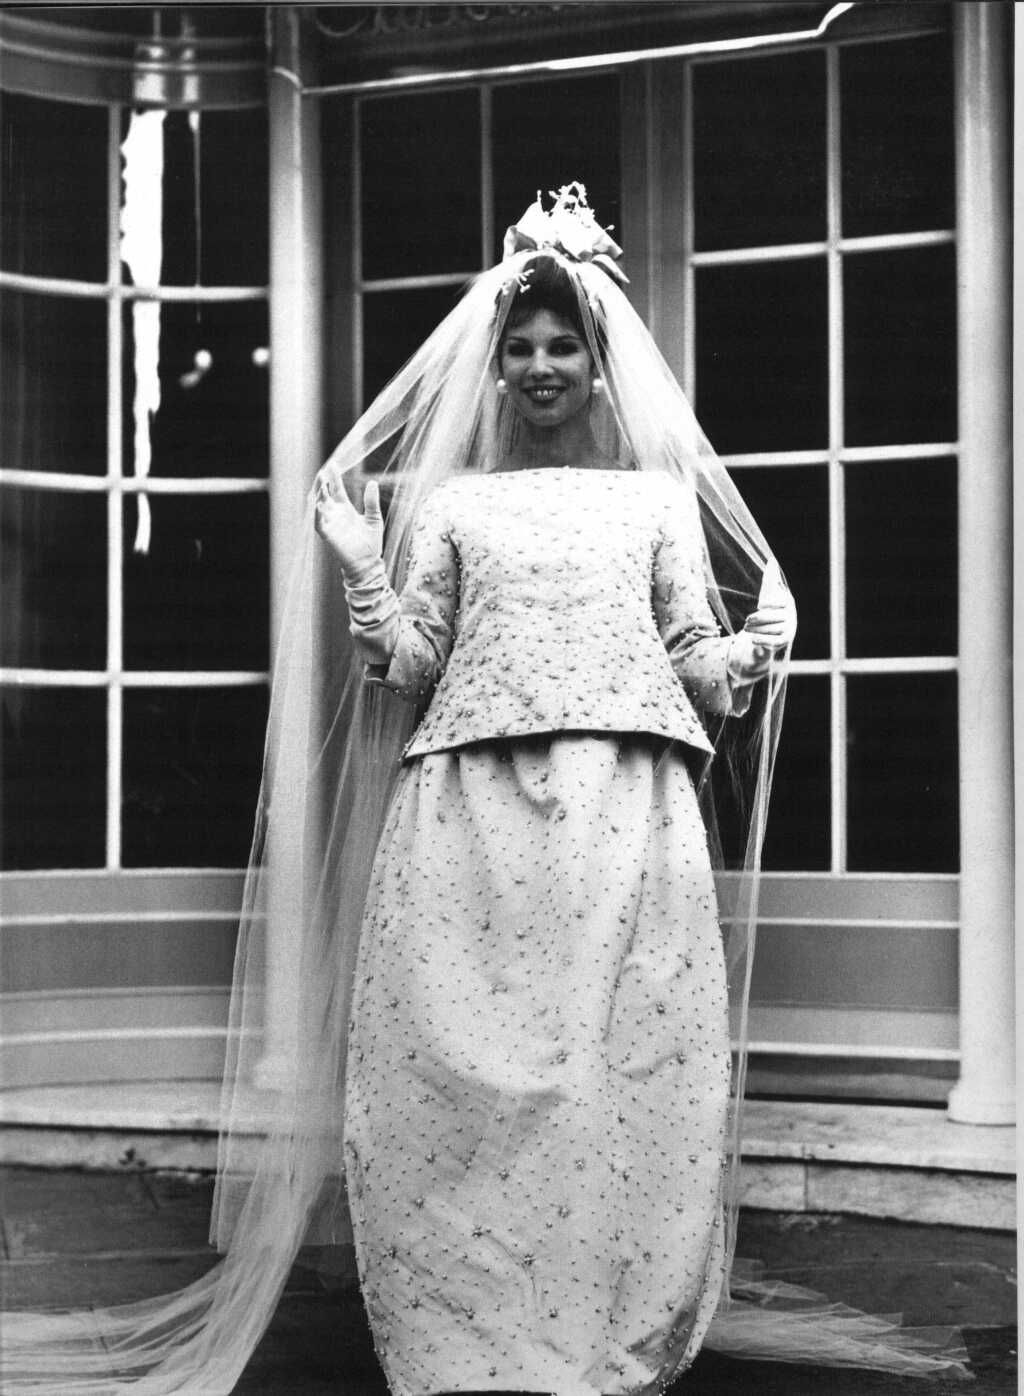 1960 victoire doutreleau in yves saint laurent for for Yves saint laurent wedding dress